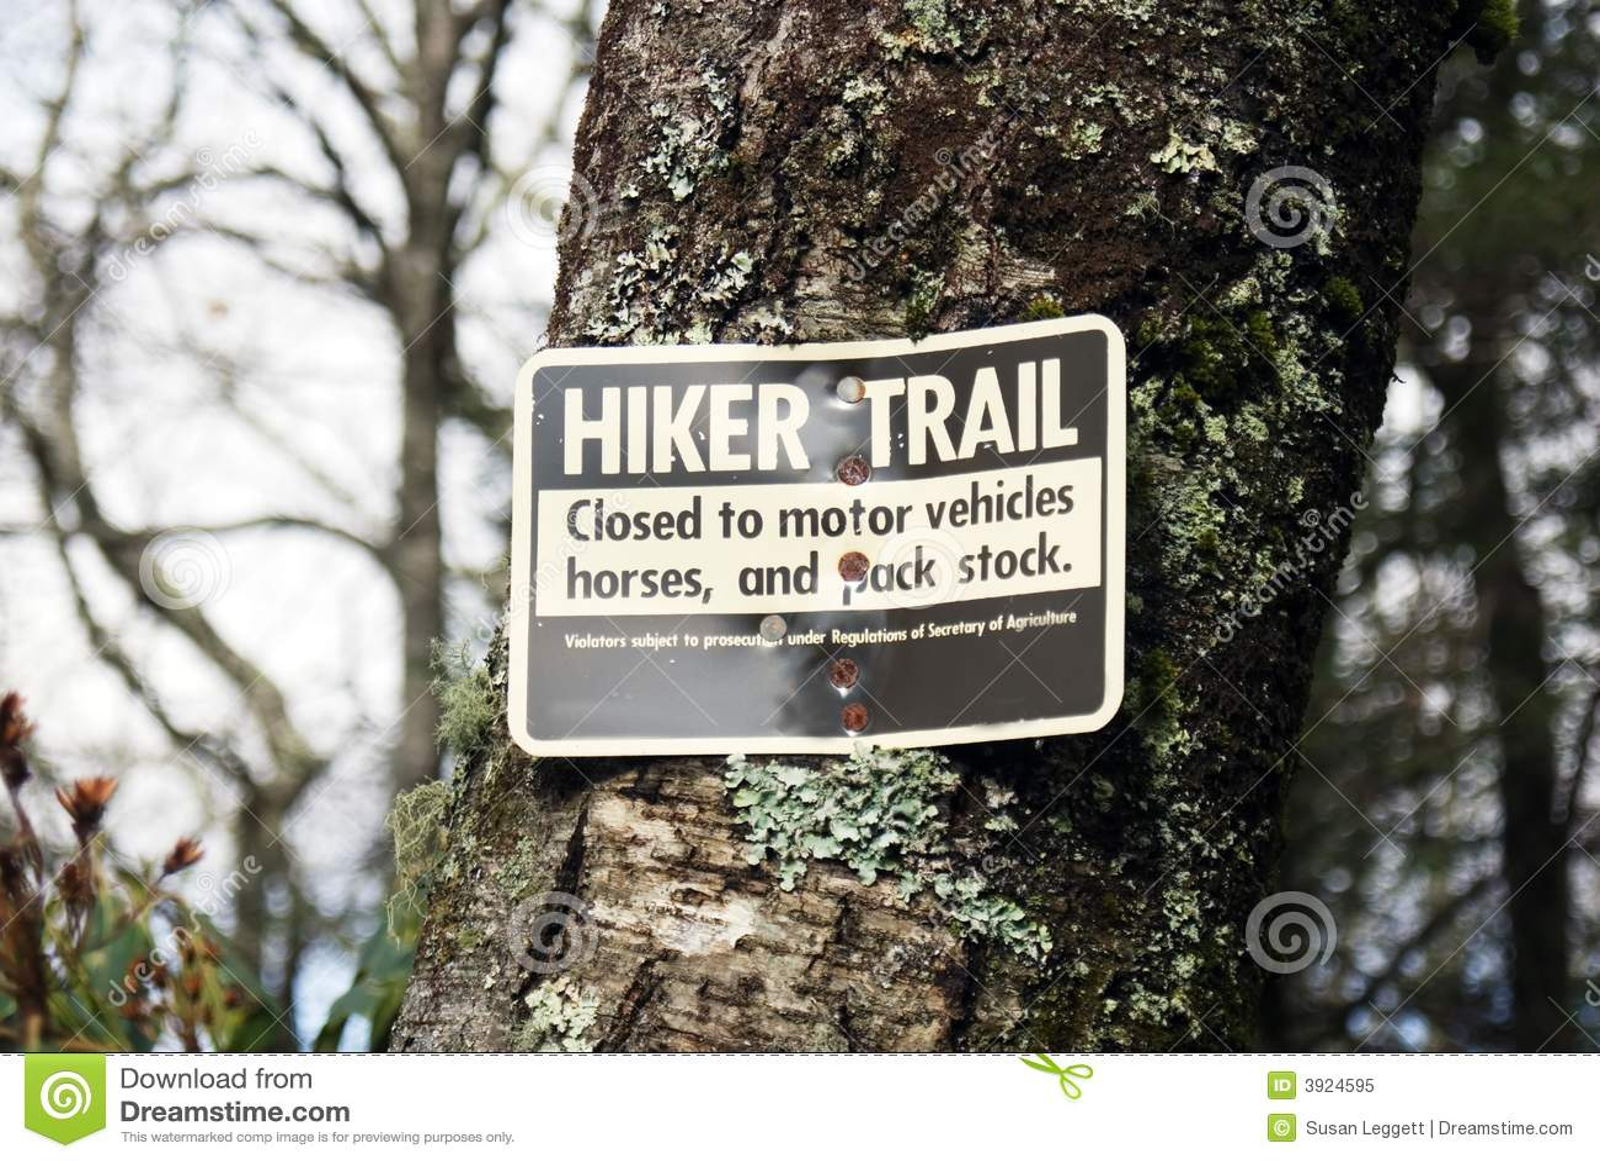 Hiker trail sign